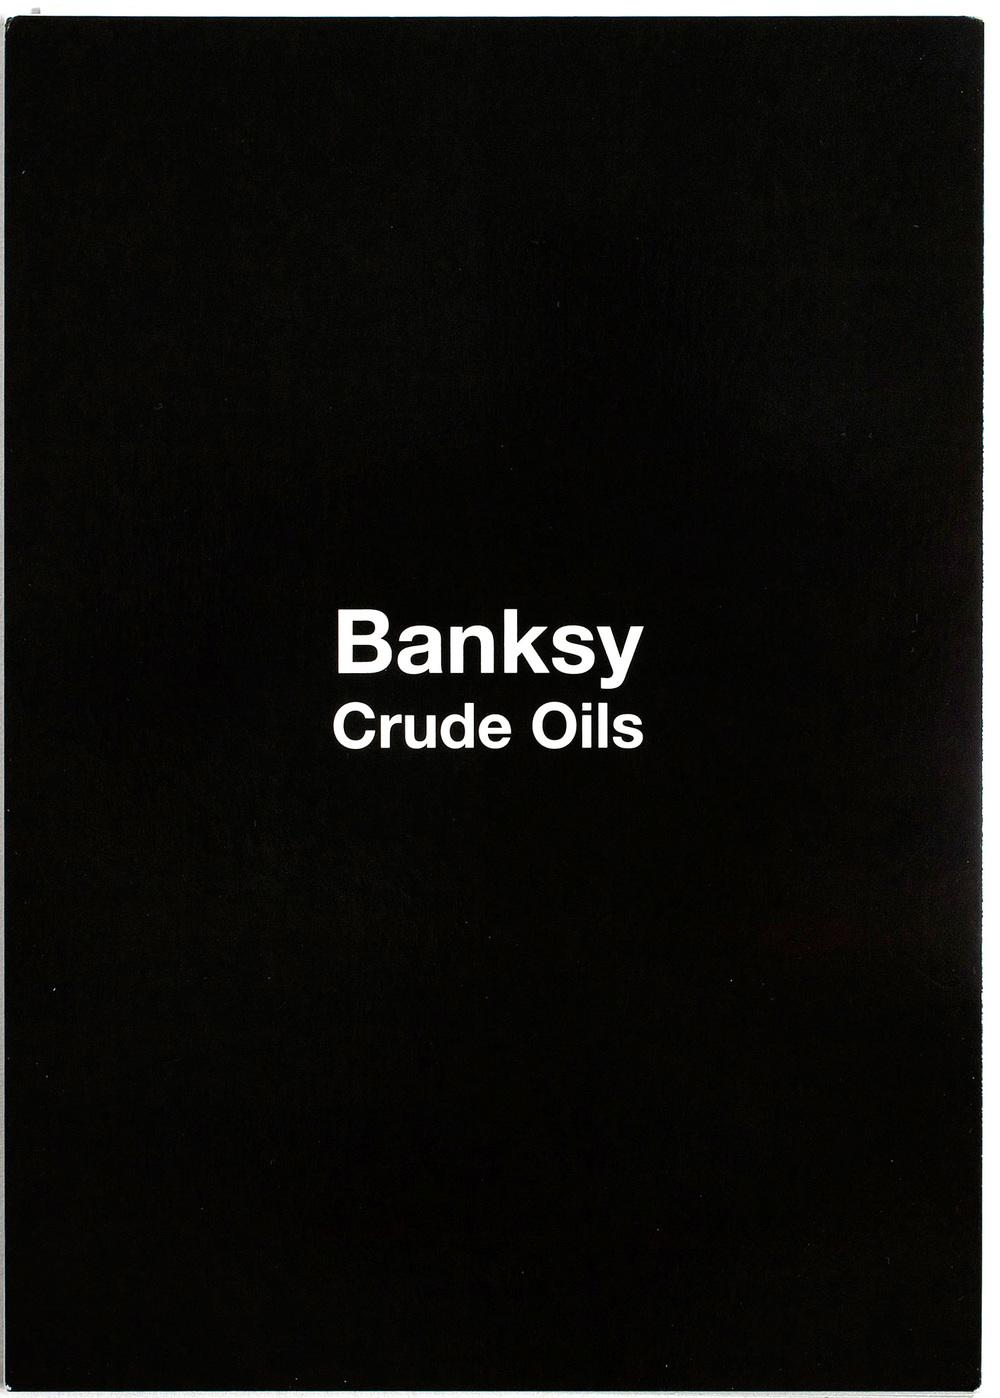 epm-print-management-bristol-art-books-pow-banksy-2.jpg